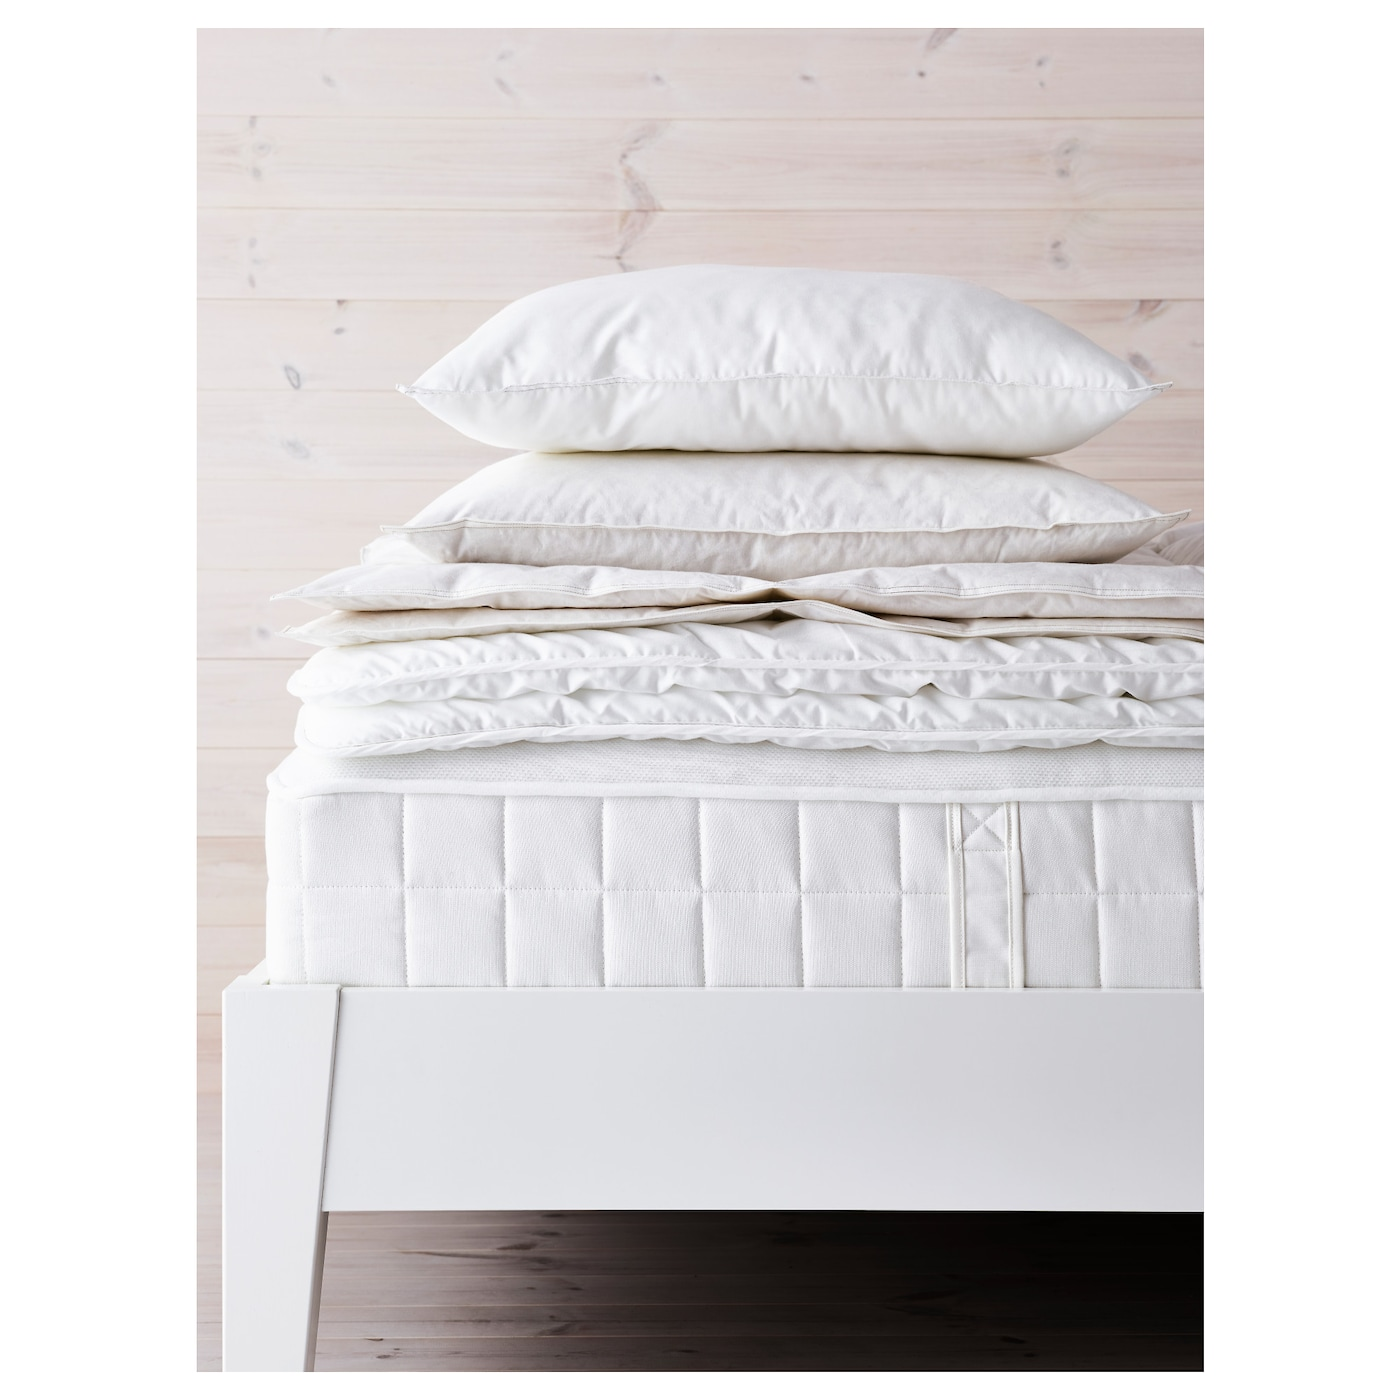 hyllestad matelas ressorts ensach s ferme blanc 160x200. Black Bedroom Furniture Sets. Home Design Ideas